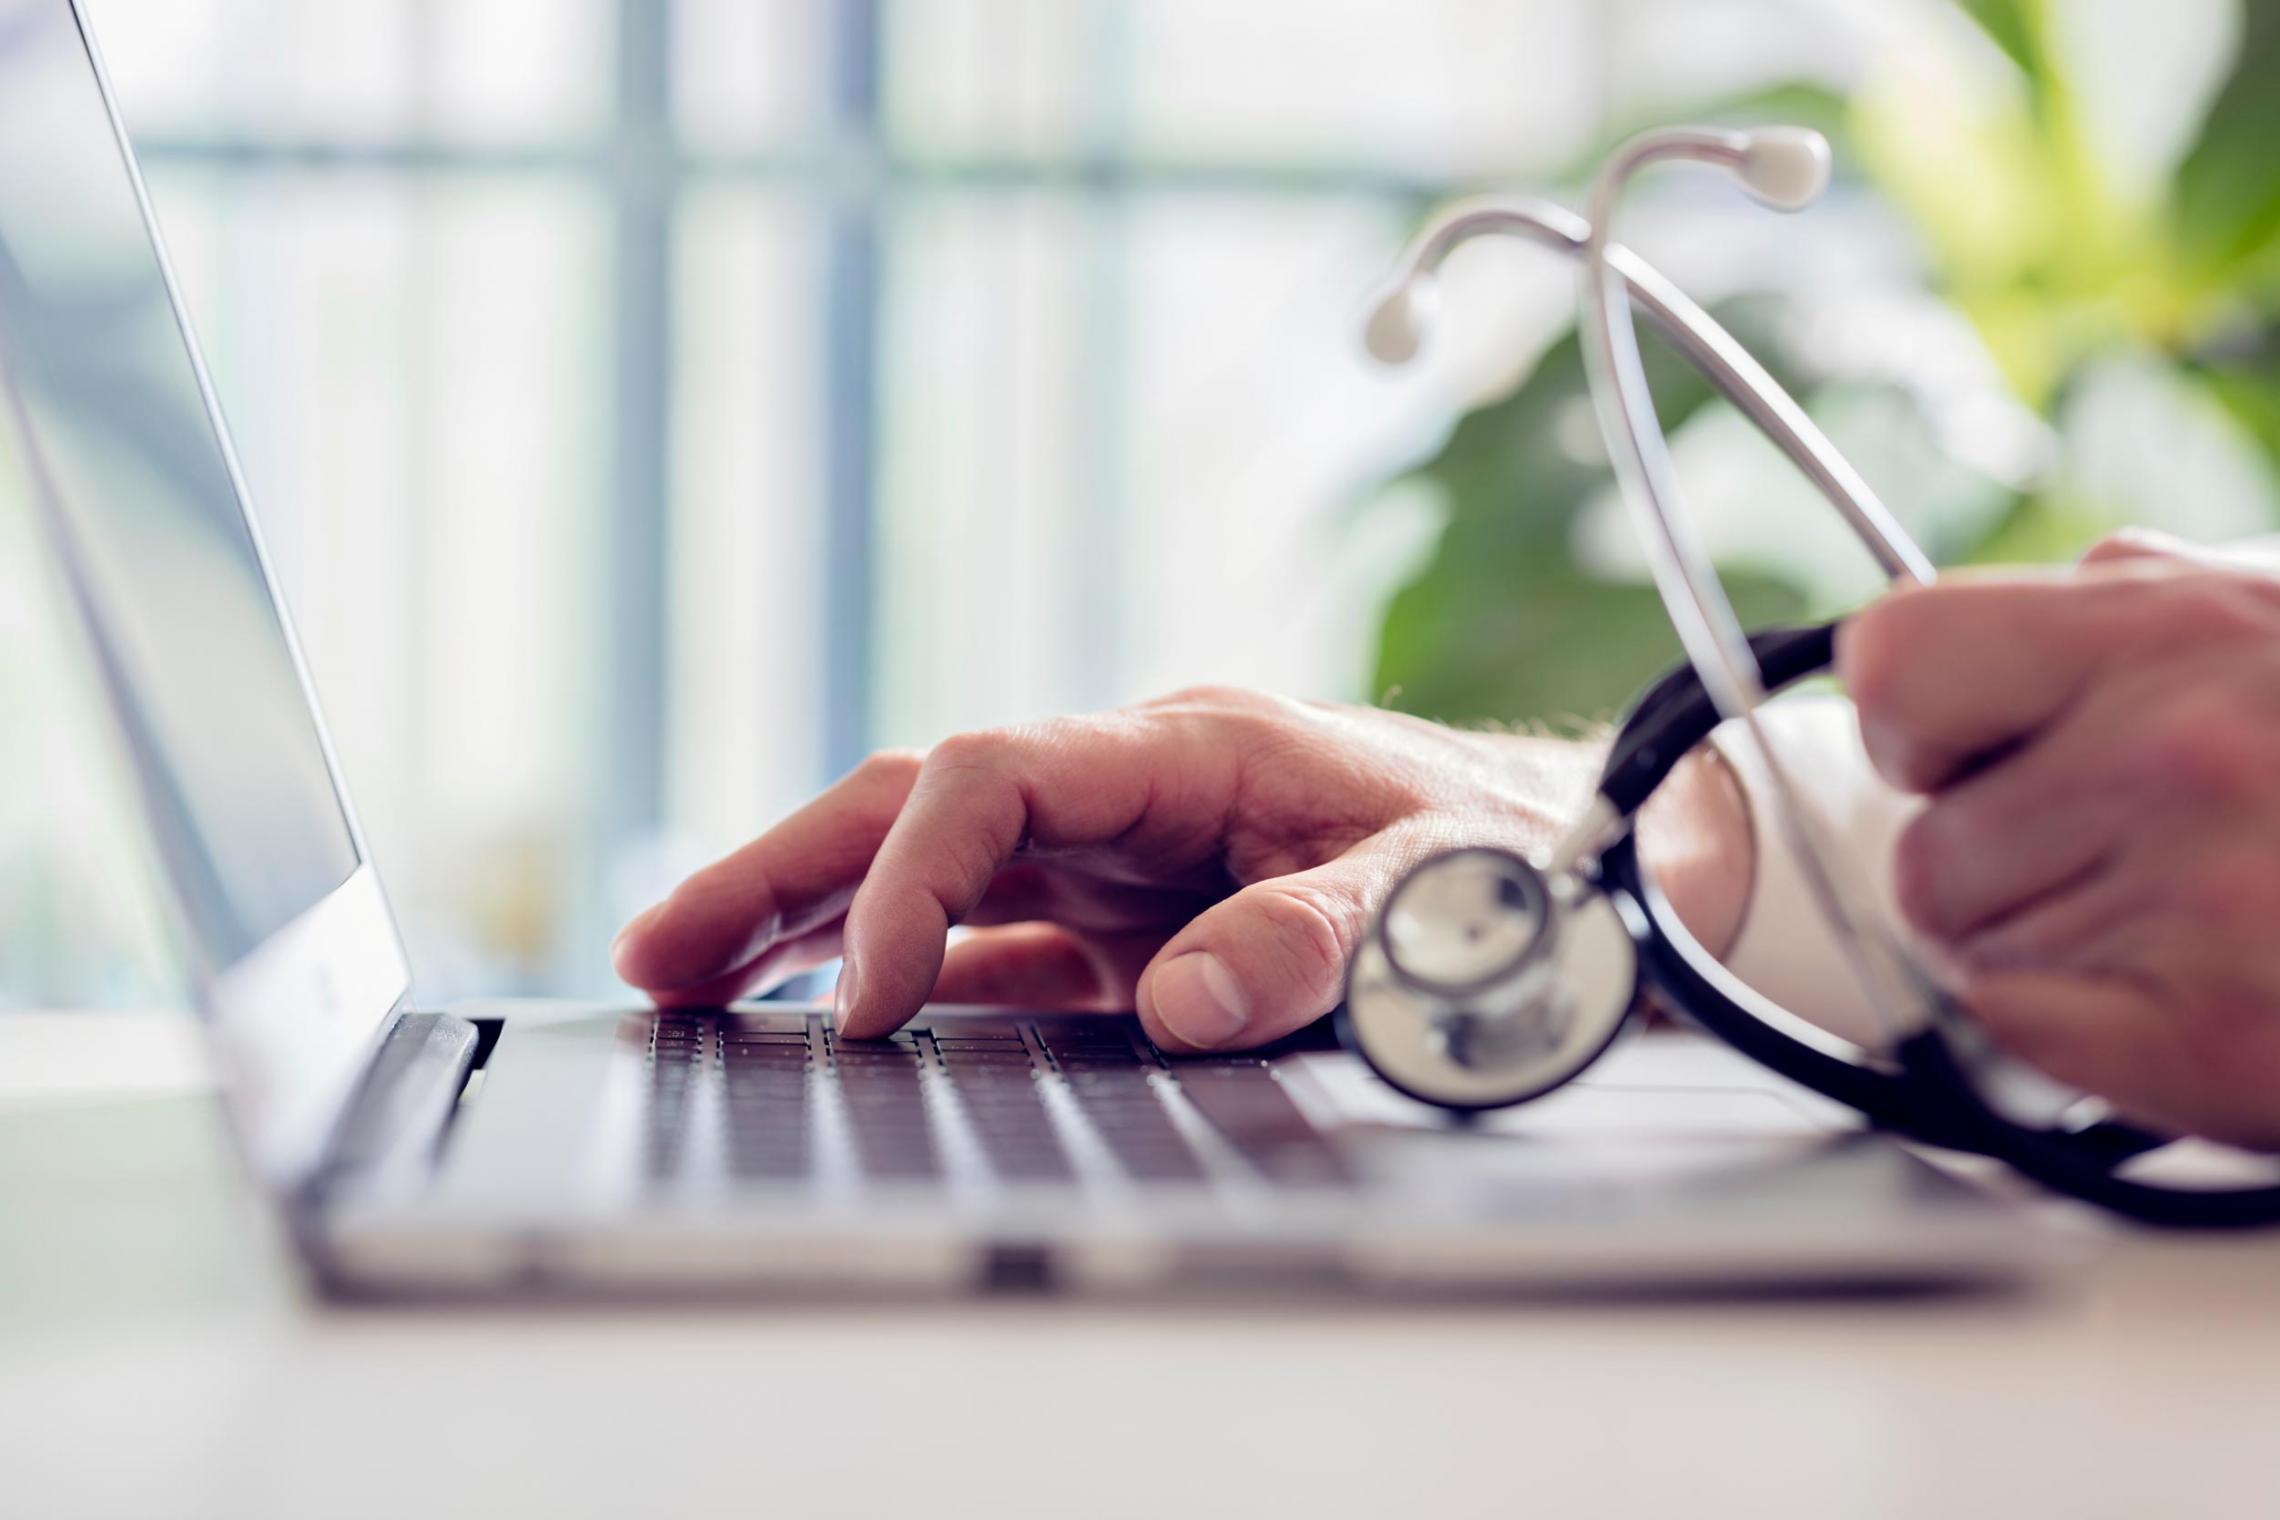 UVA Health System Expanding Telehealth to Better Treat Diabetes, Heart Disease